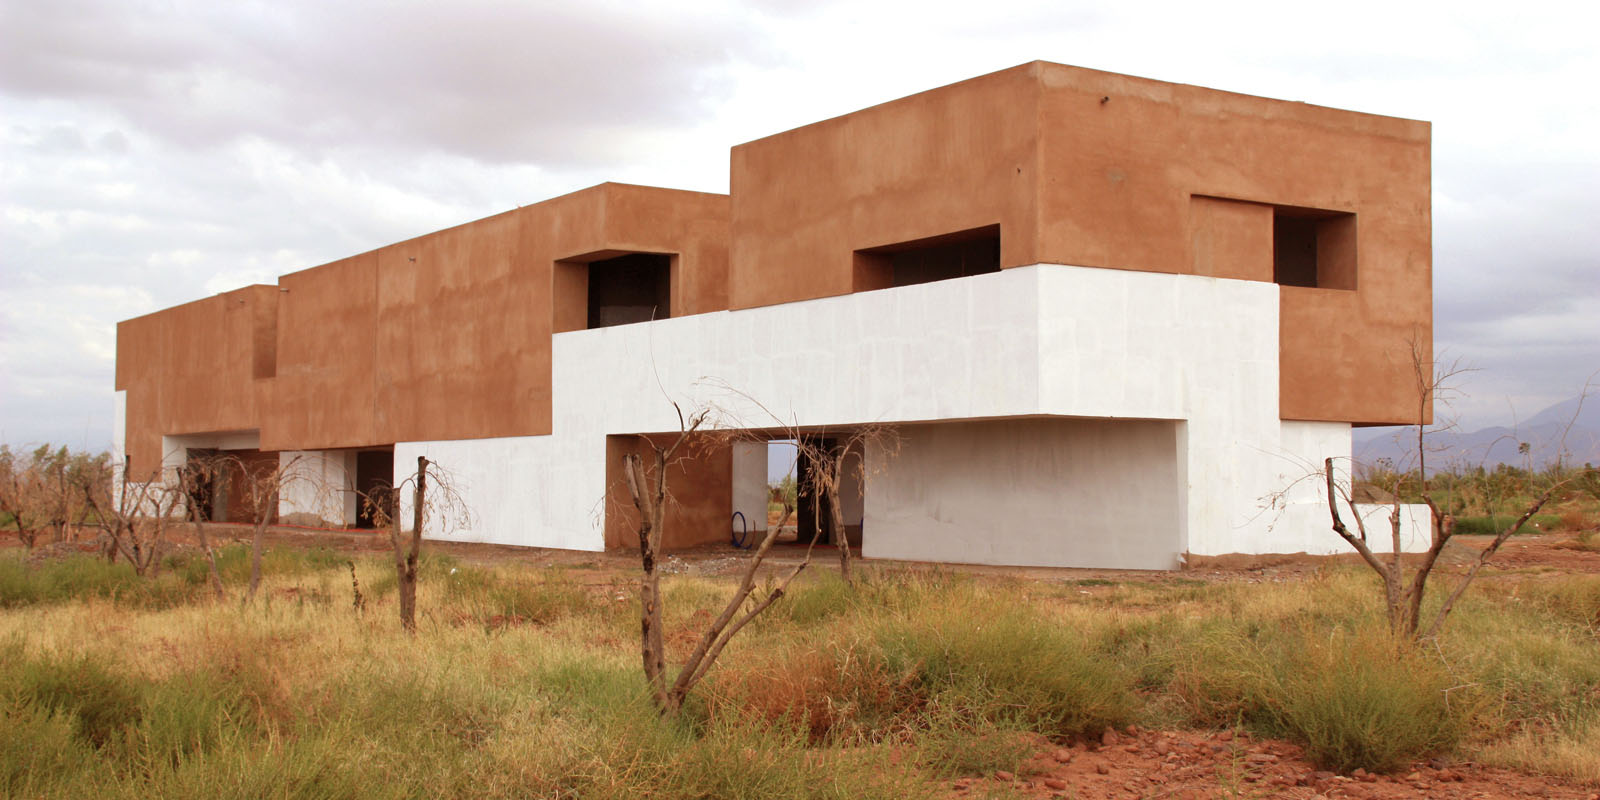 co-habitation-kilo-architectures-luc-boegly-05